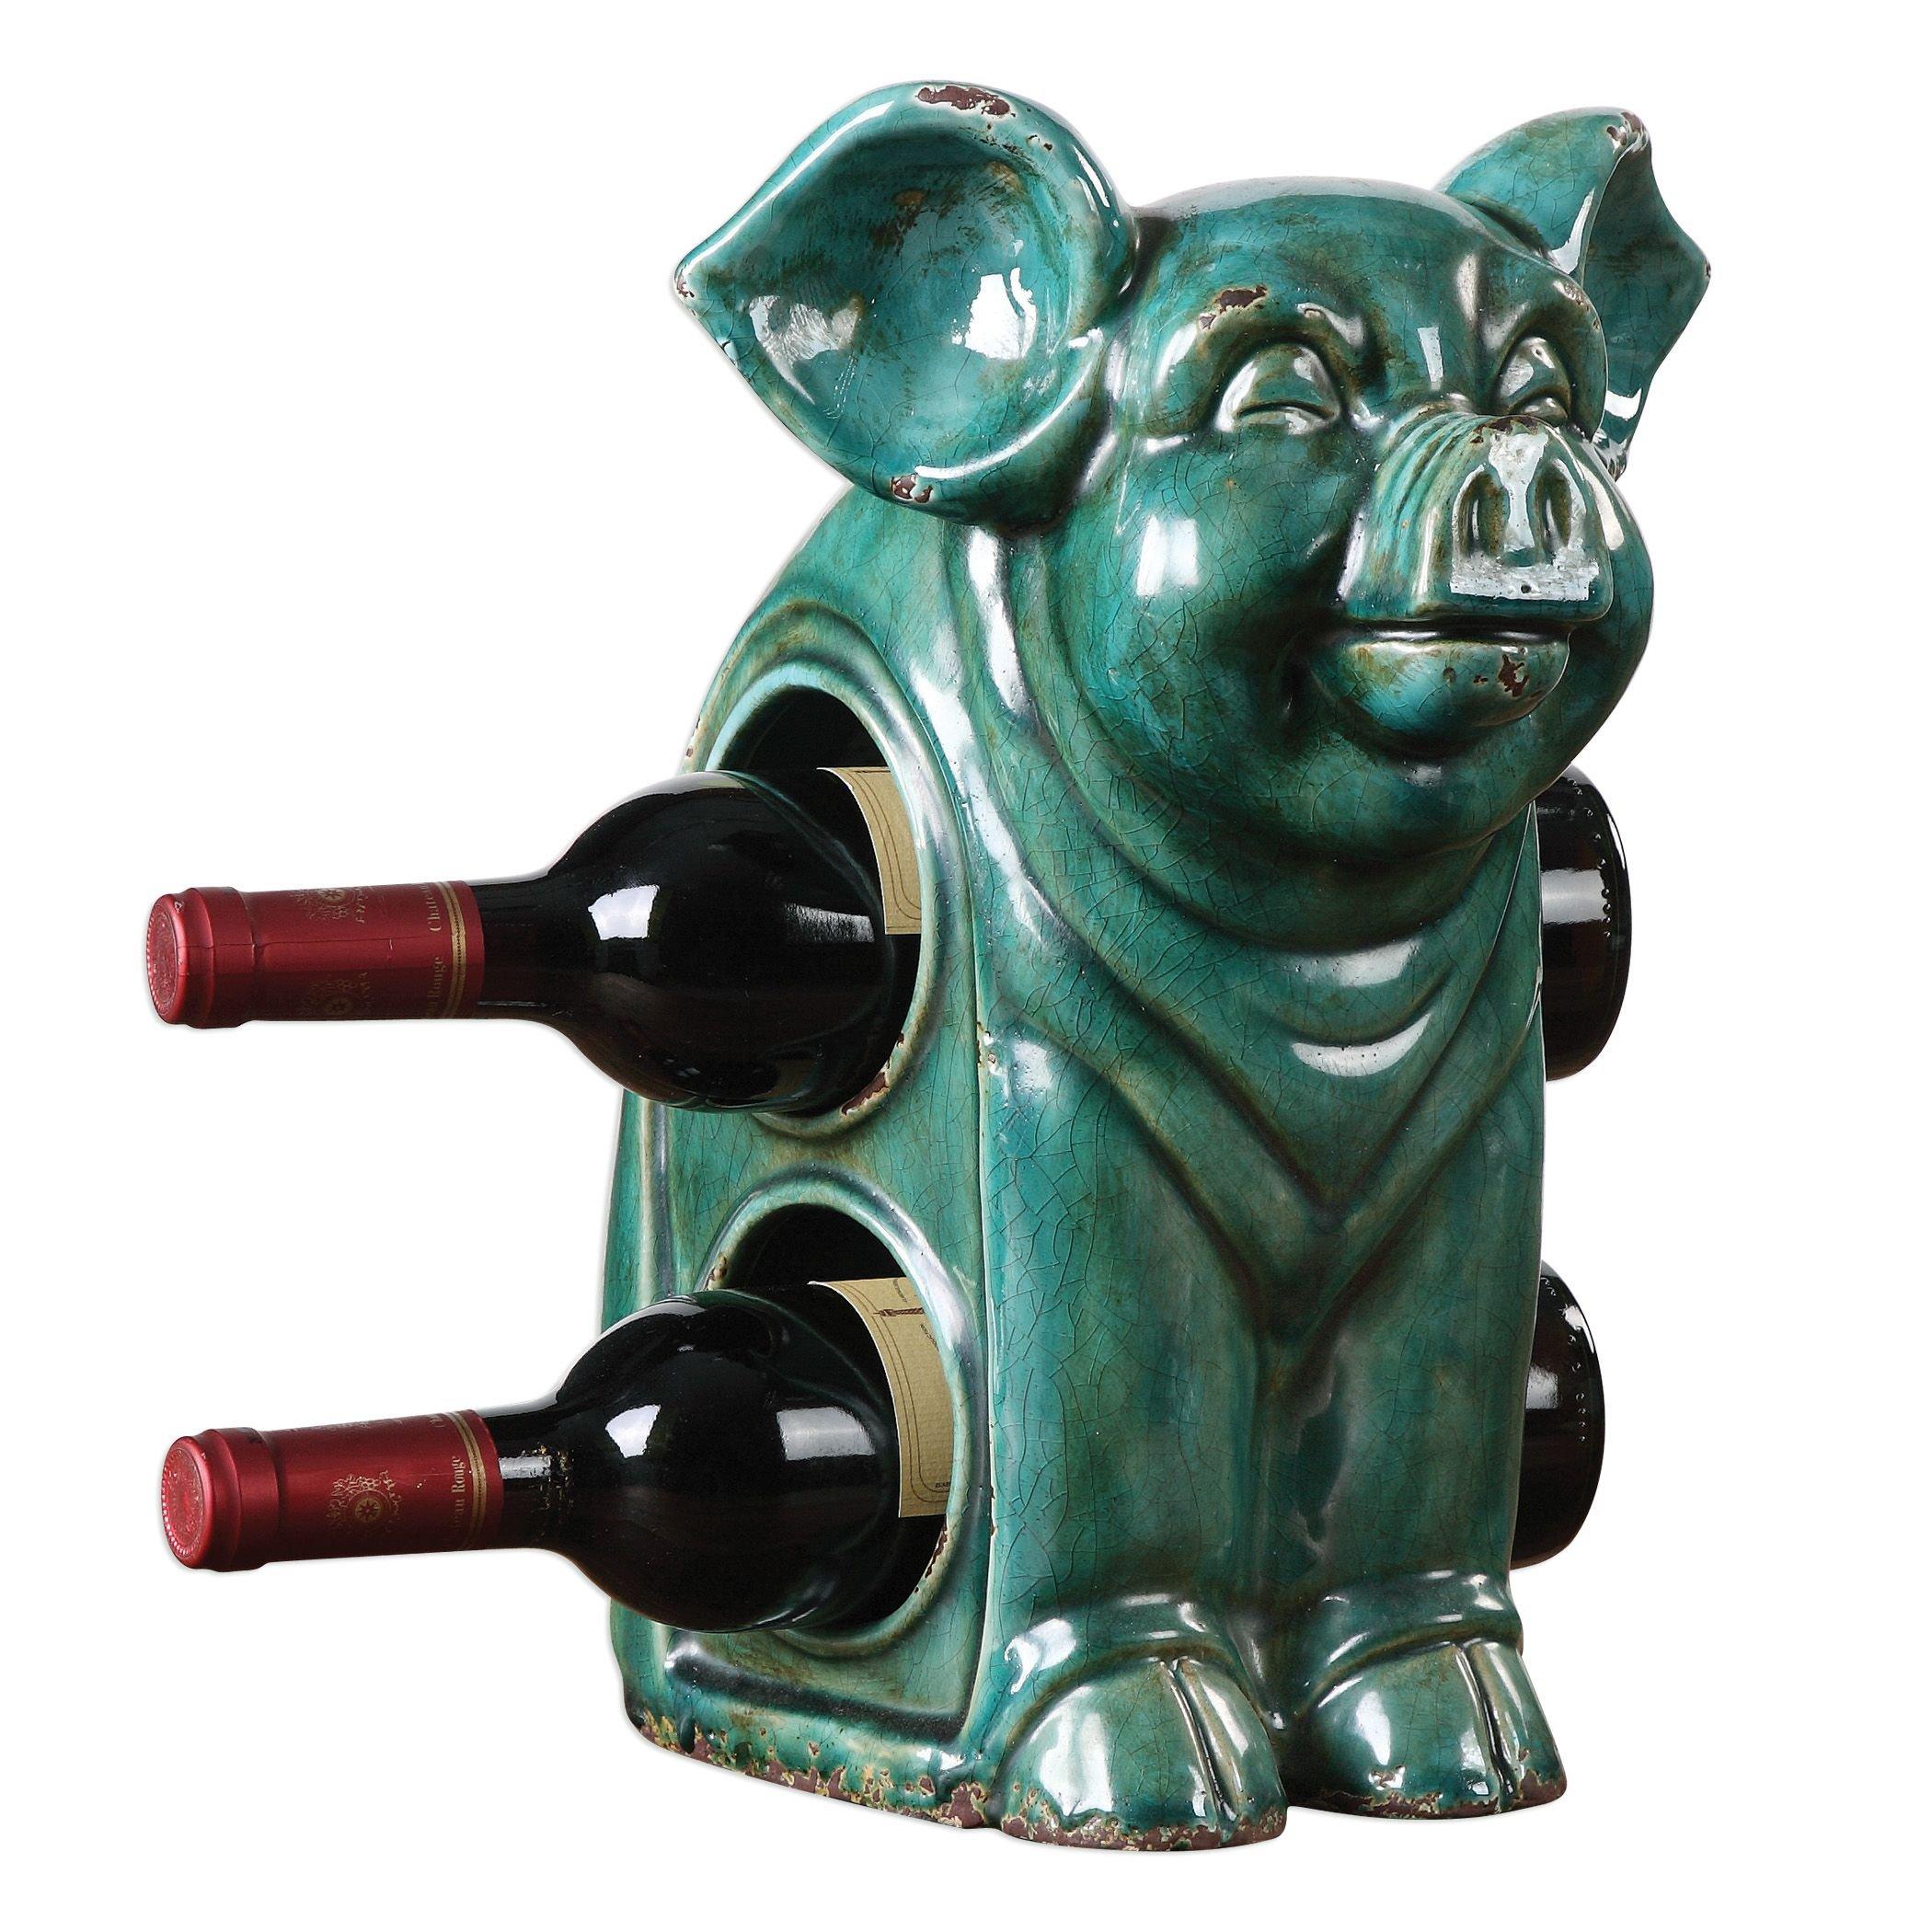 Turquoise Blue Green Ceramic Pig Wine Holder | Bottle Rack Tabletop